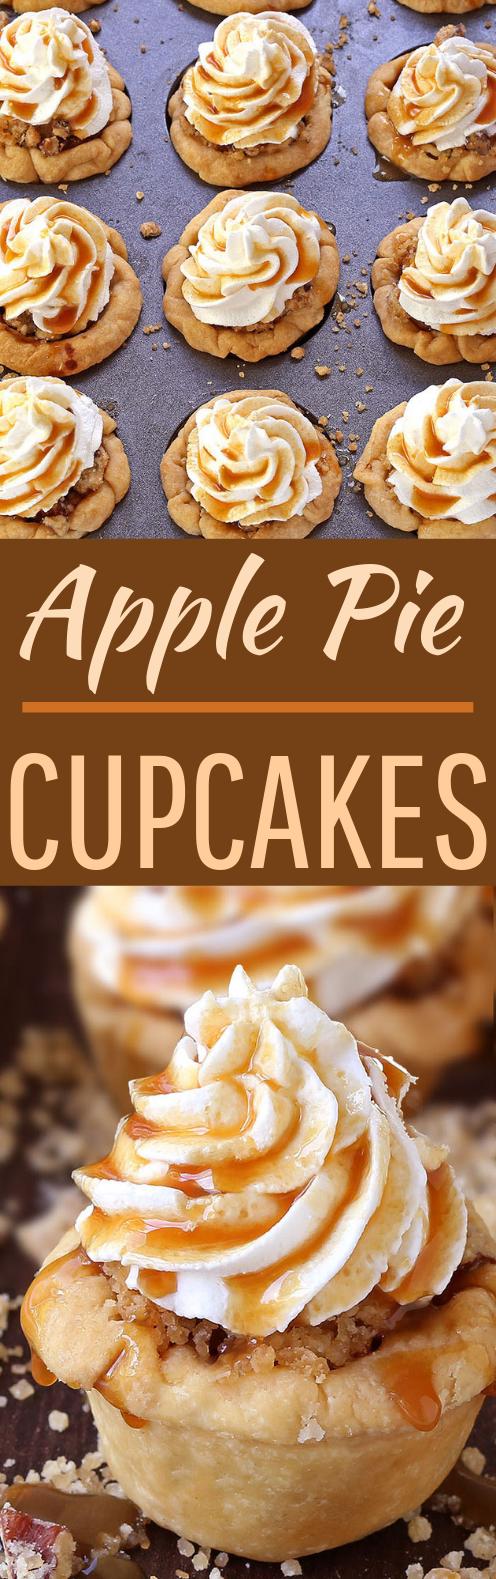 Apple Pie Cupcakes #desserts #cupcakes